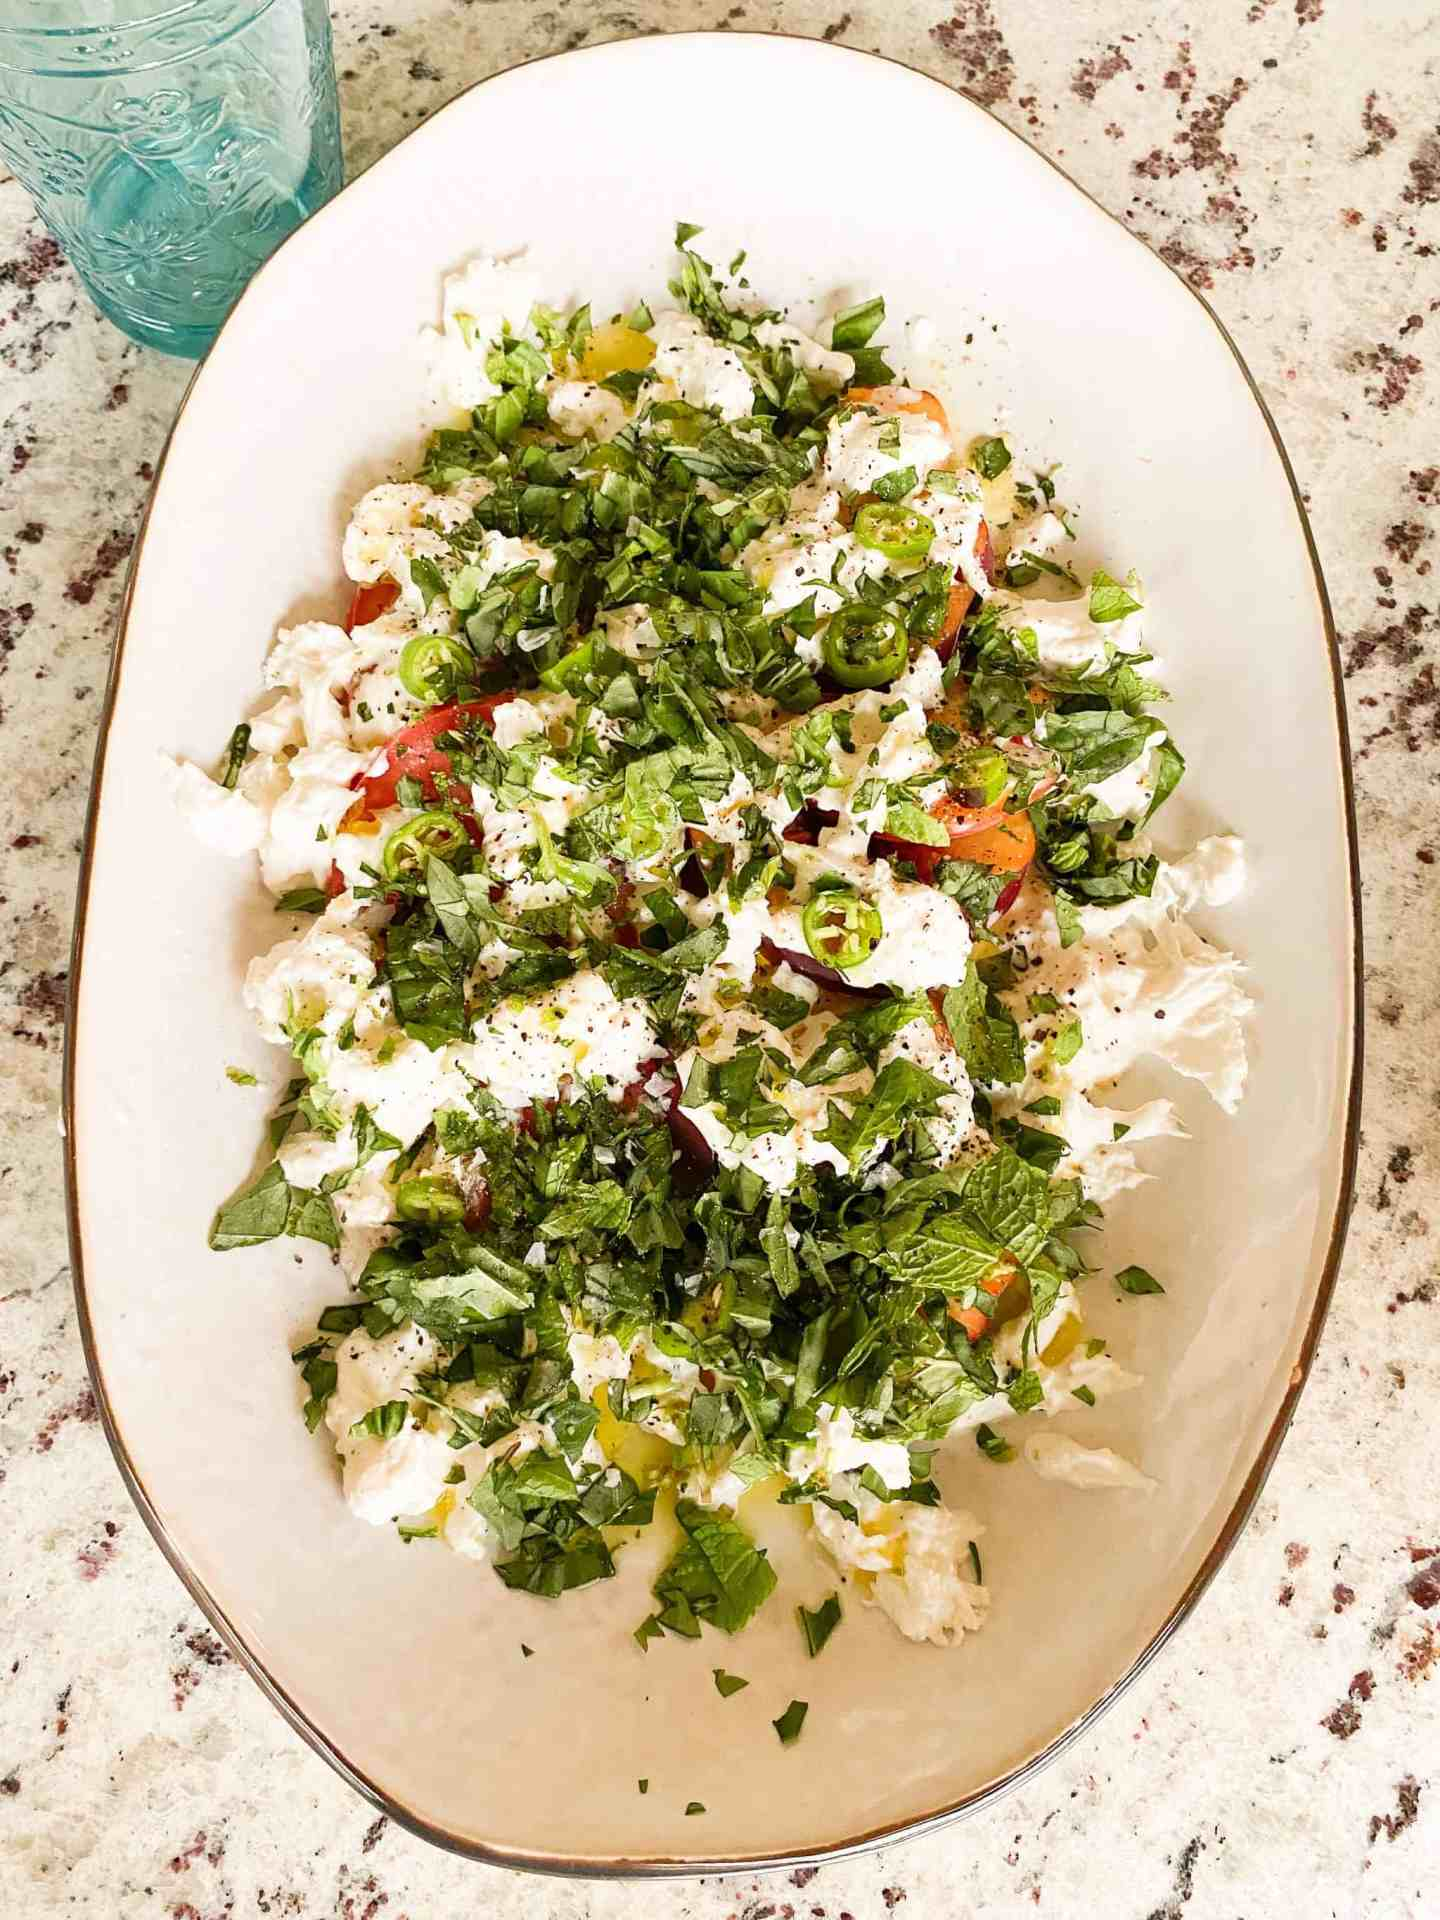 Peach-Burrata-and-Serano-Salad-1